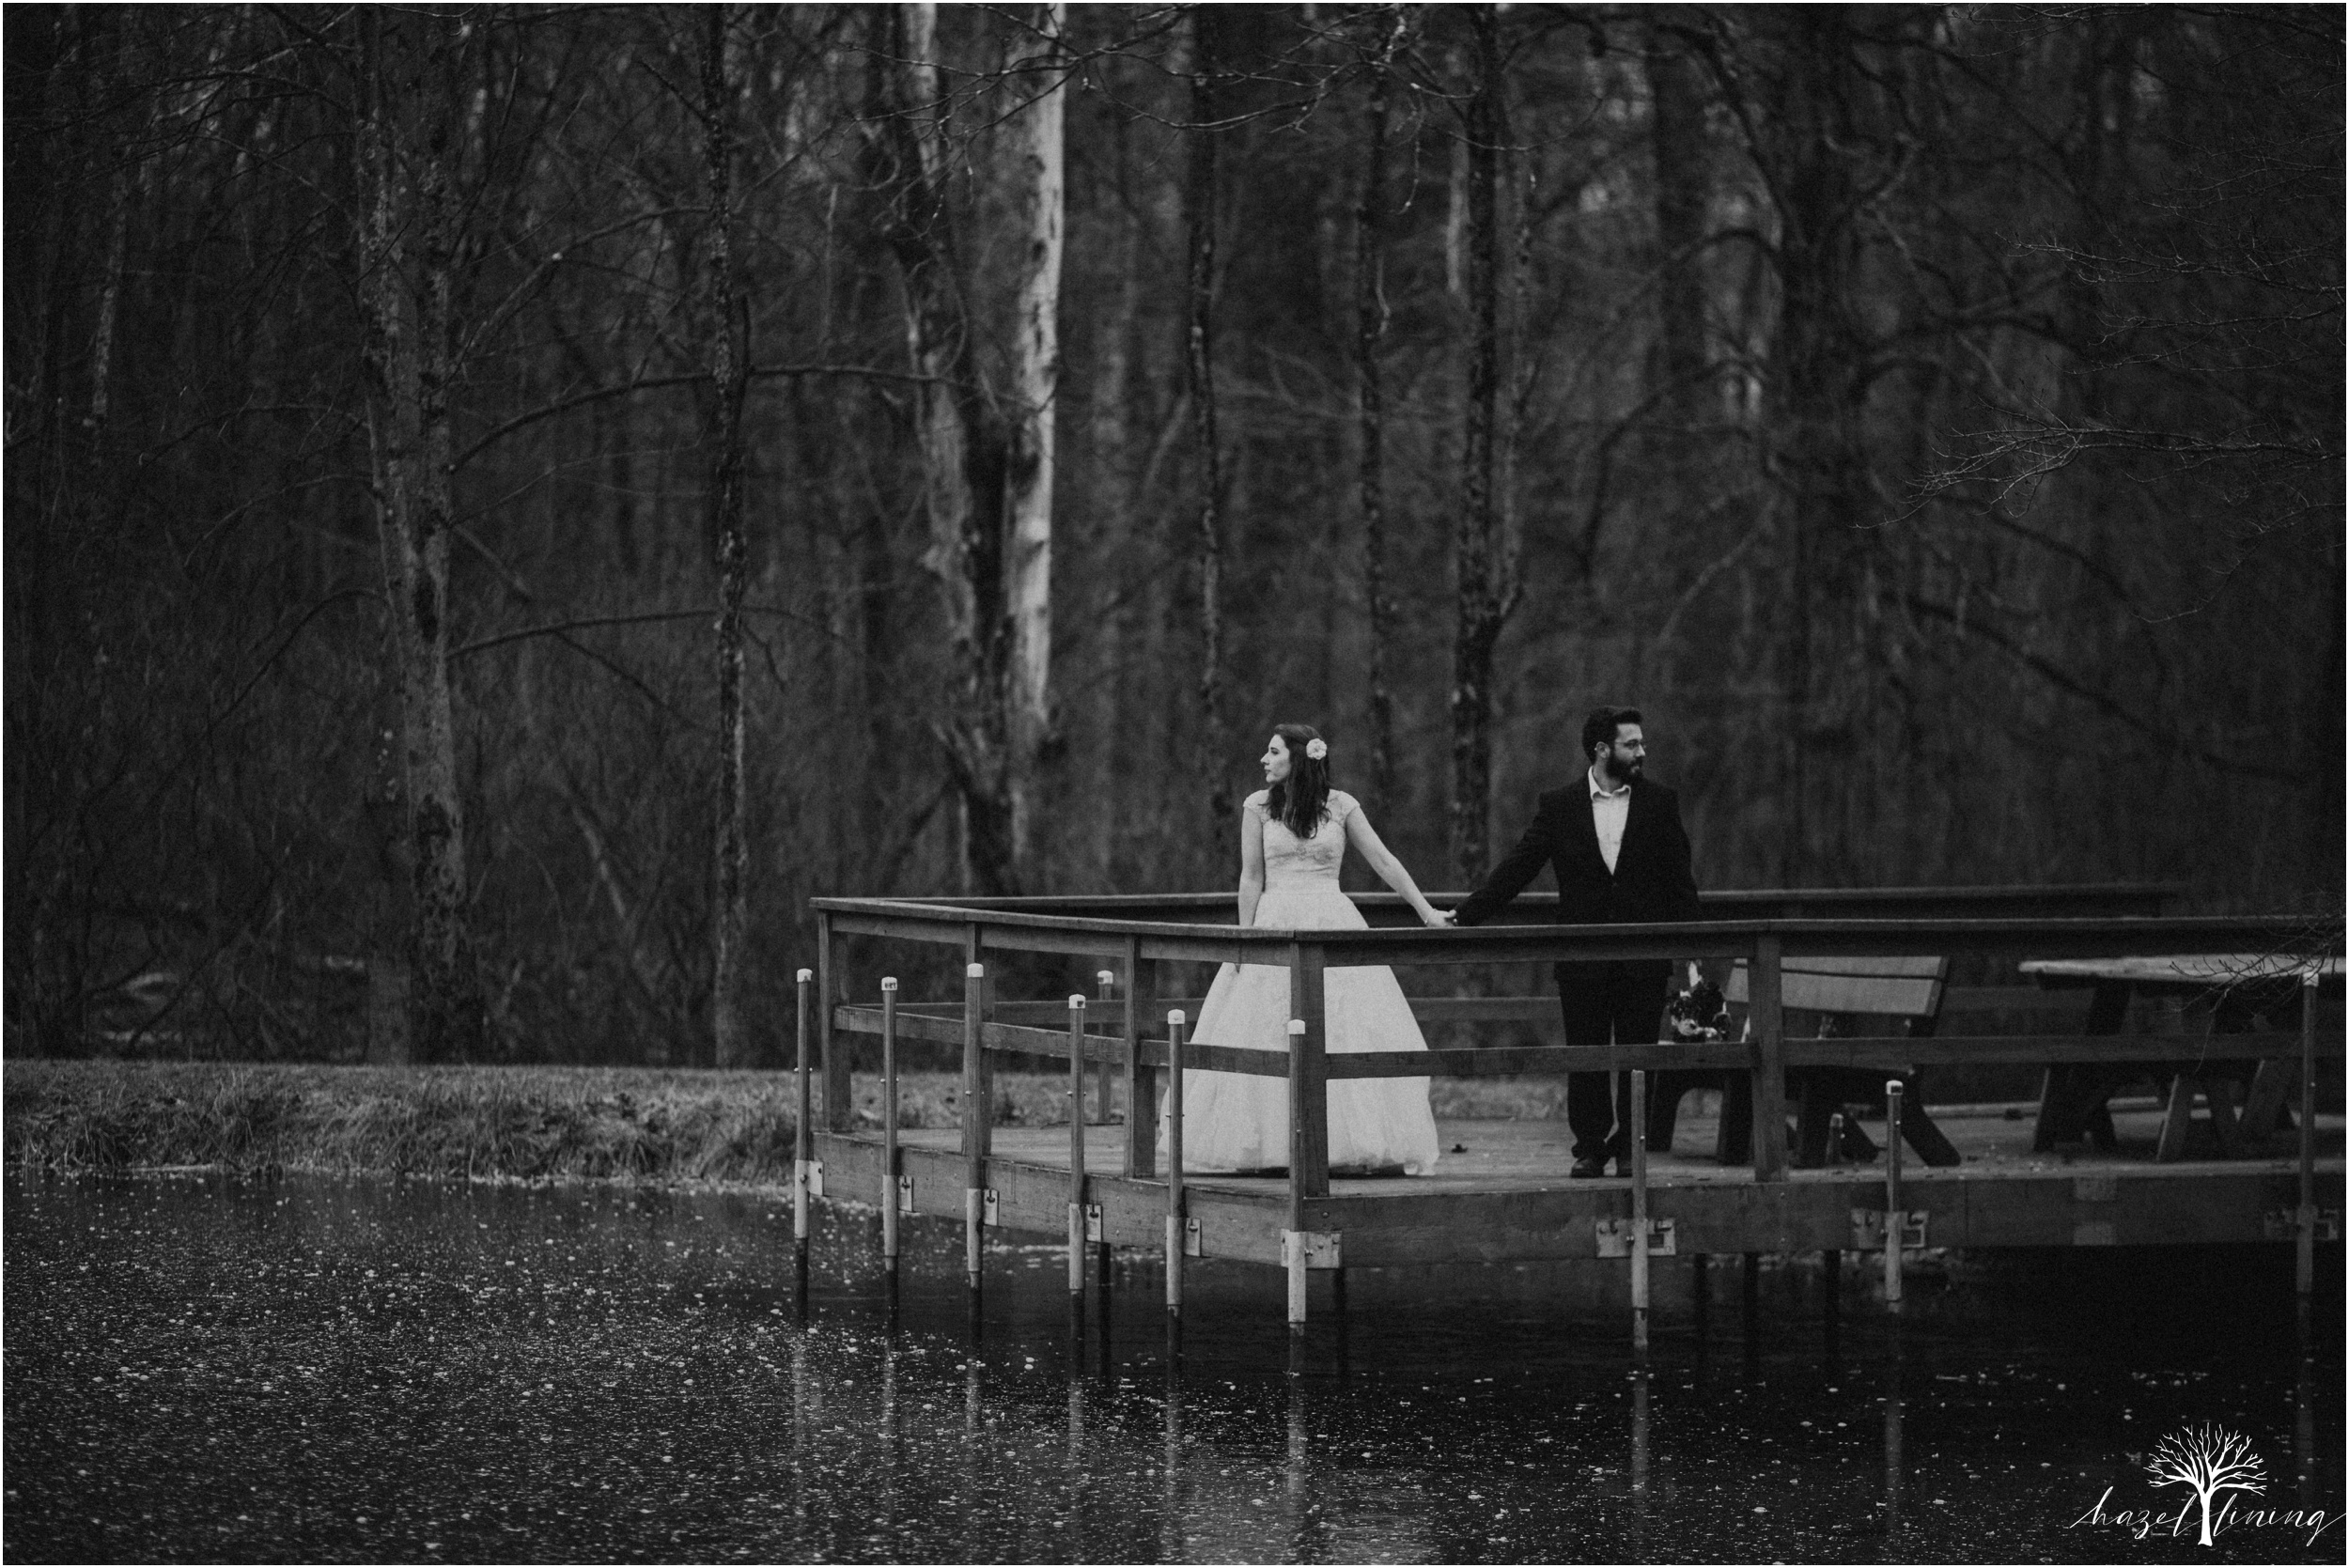 evan-maggie-lesh-one-year-anniversary-winter-shoot-camp-menolan-pennsylvania_0066.jpg